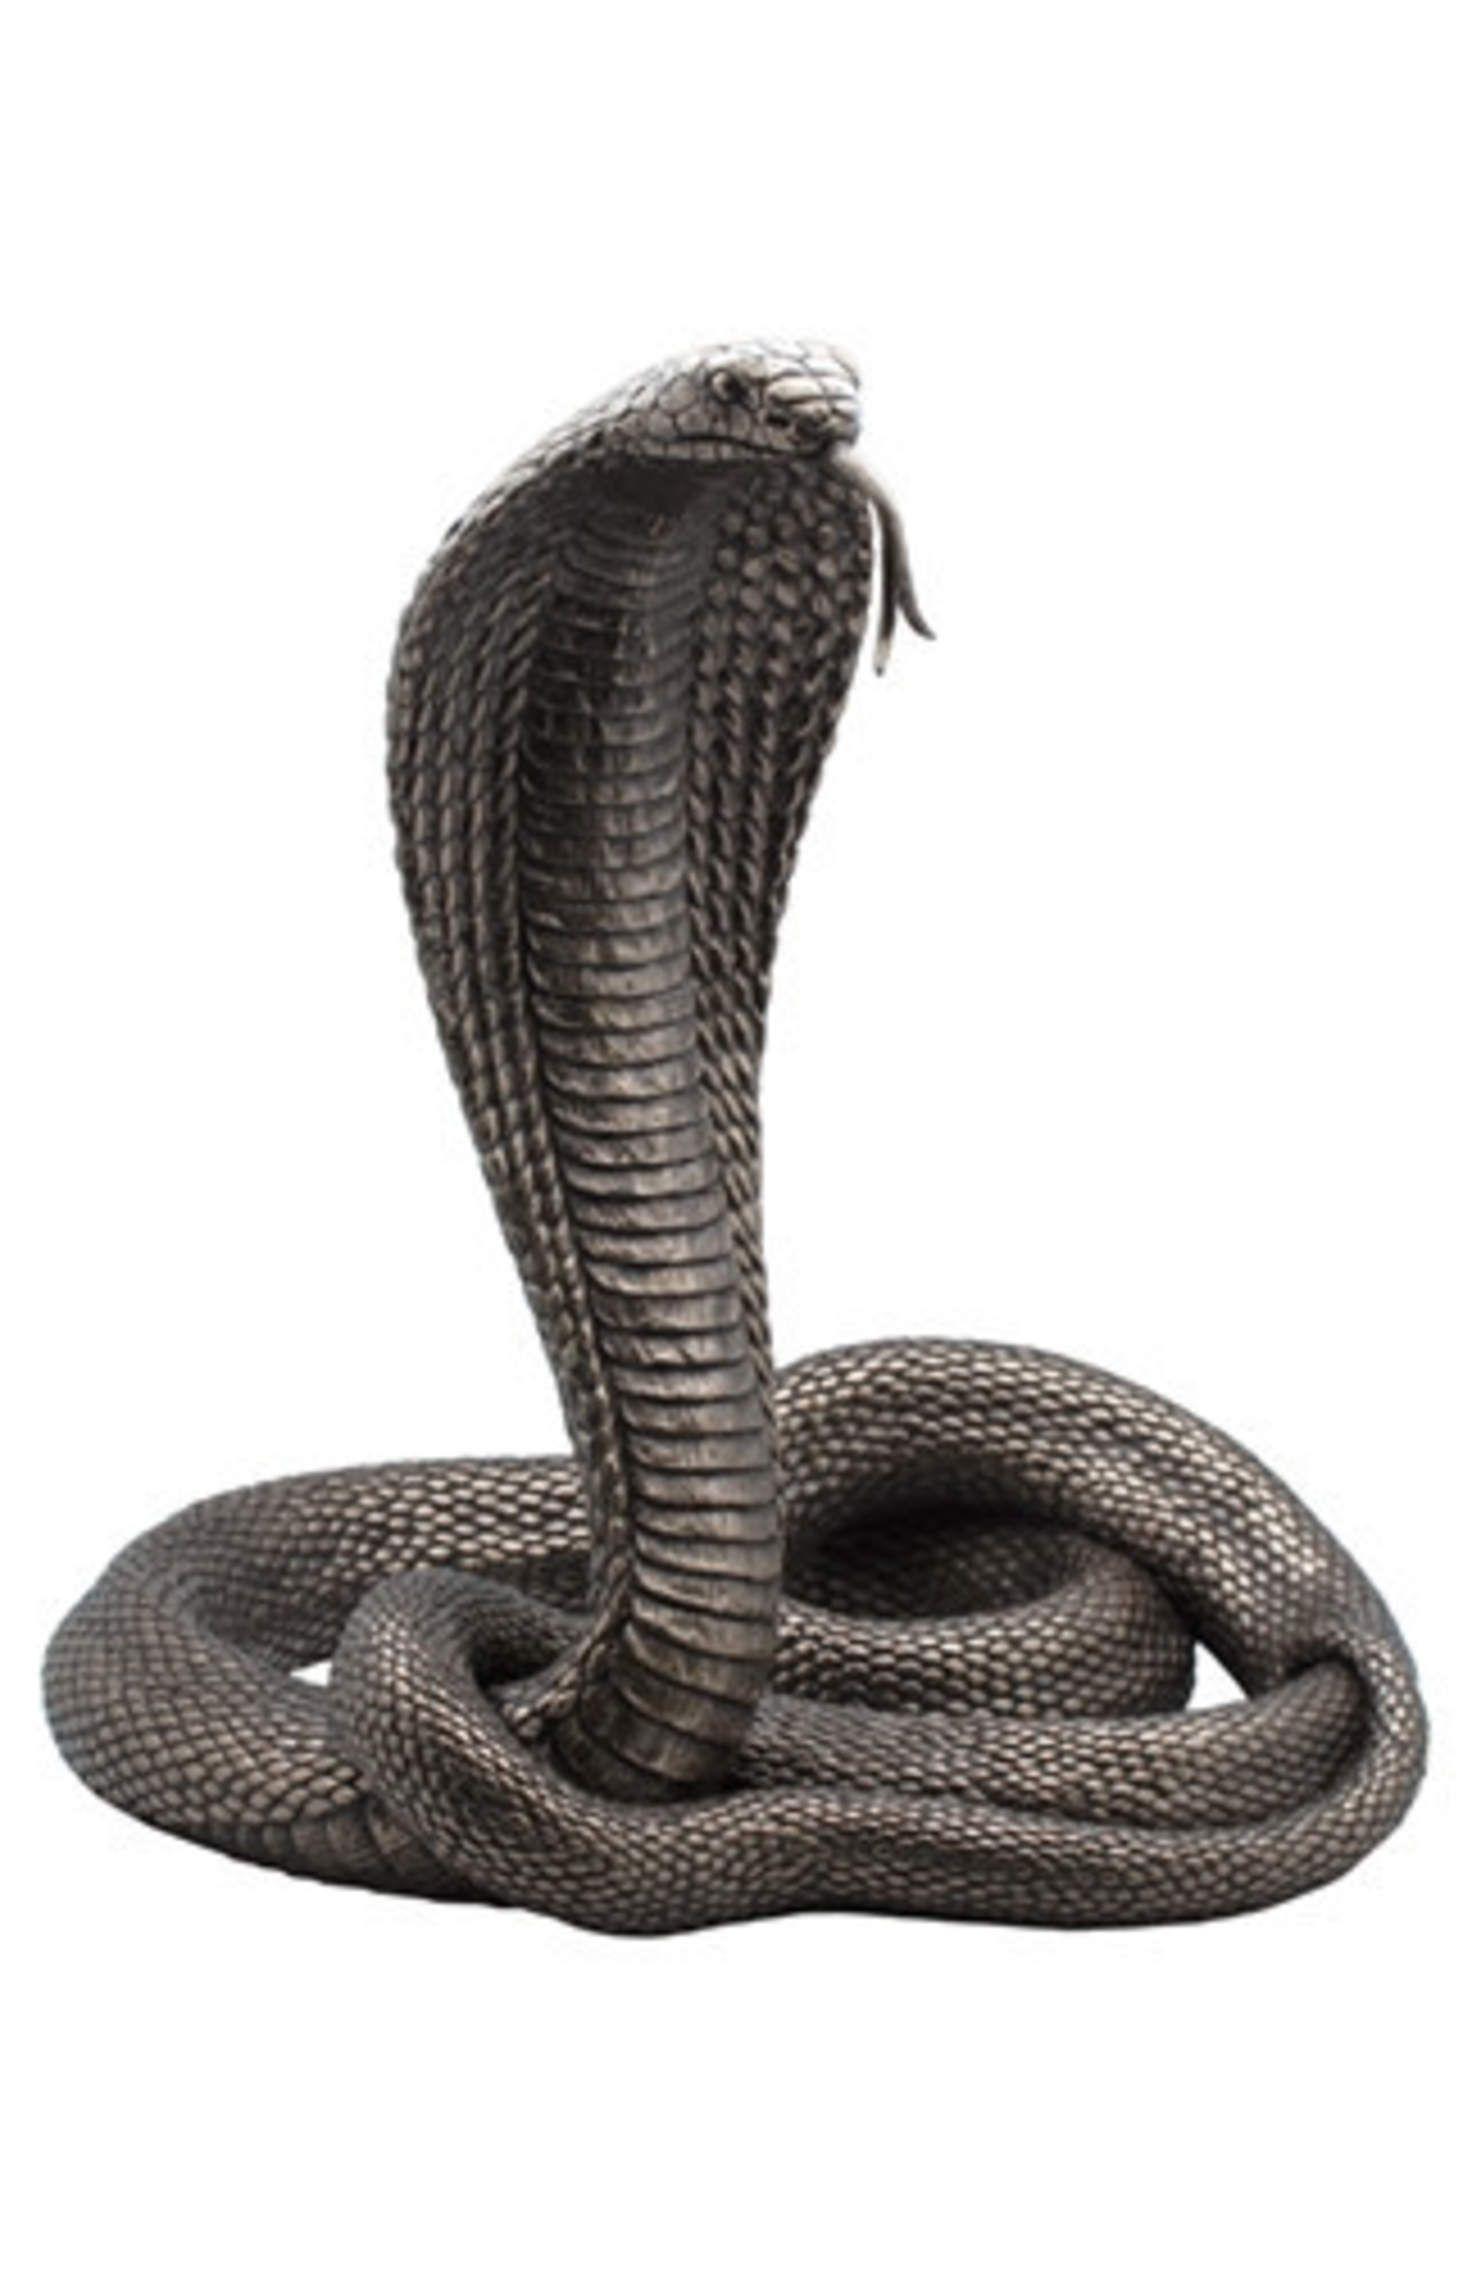 King Cobra Snake Head Anatomy Topsimages